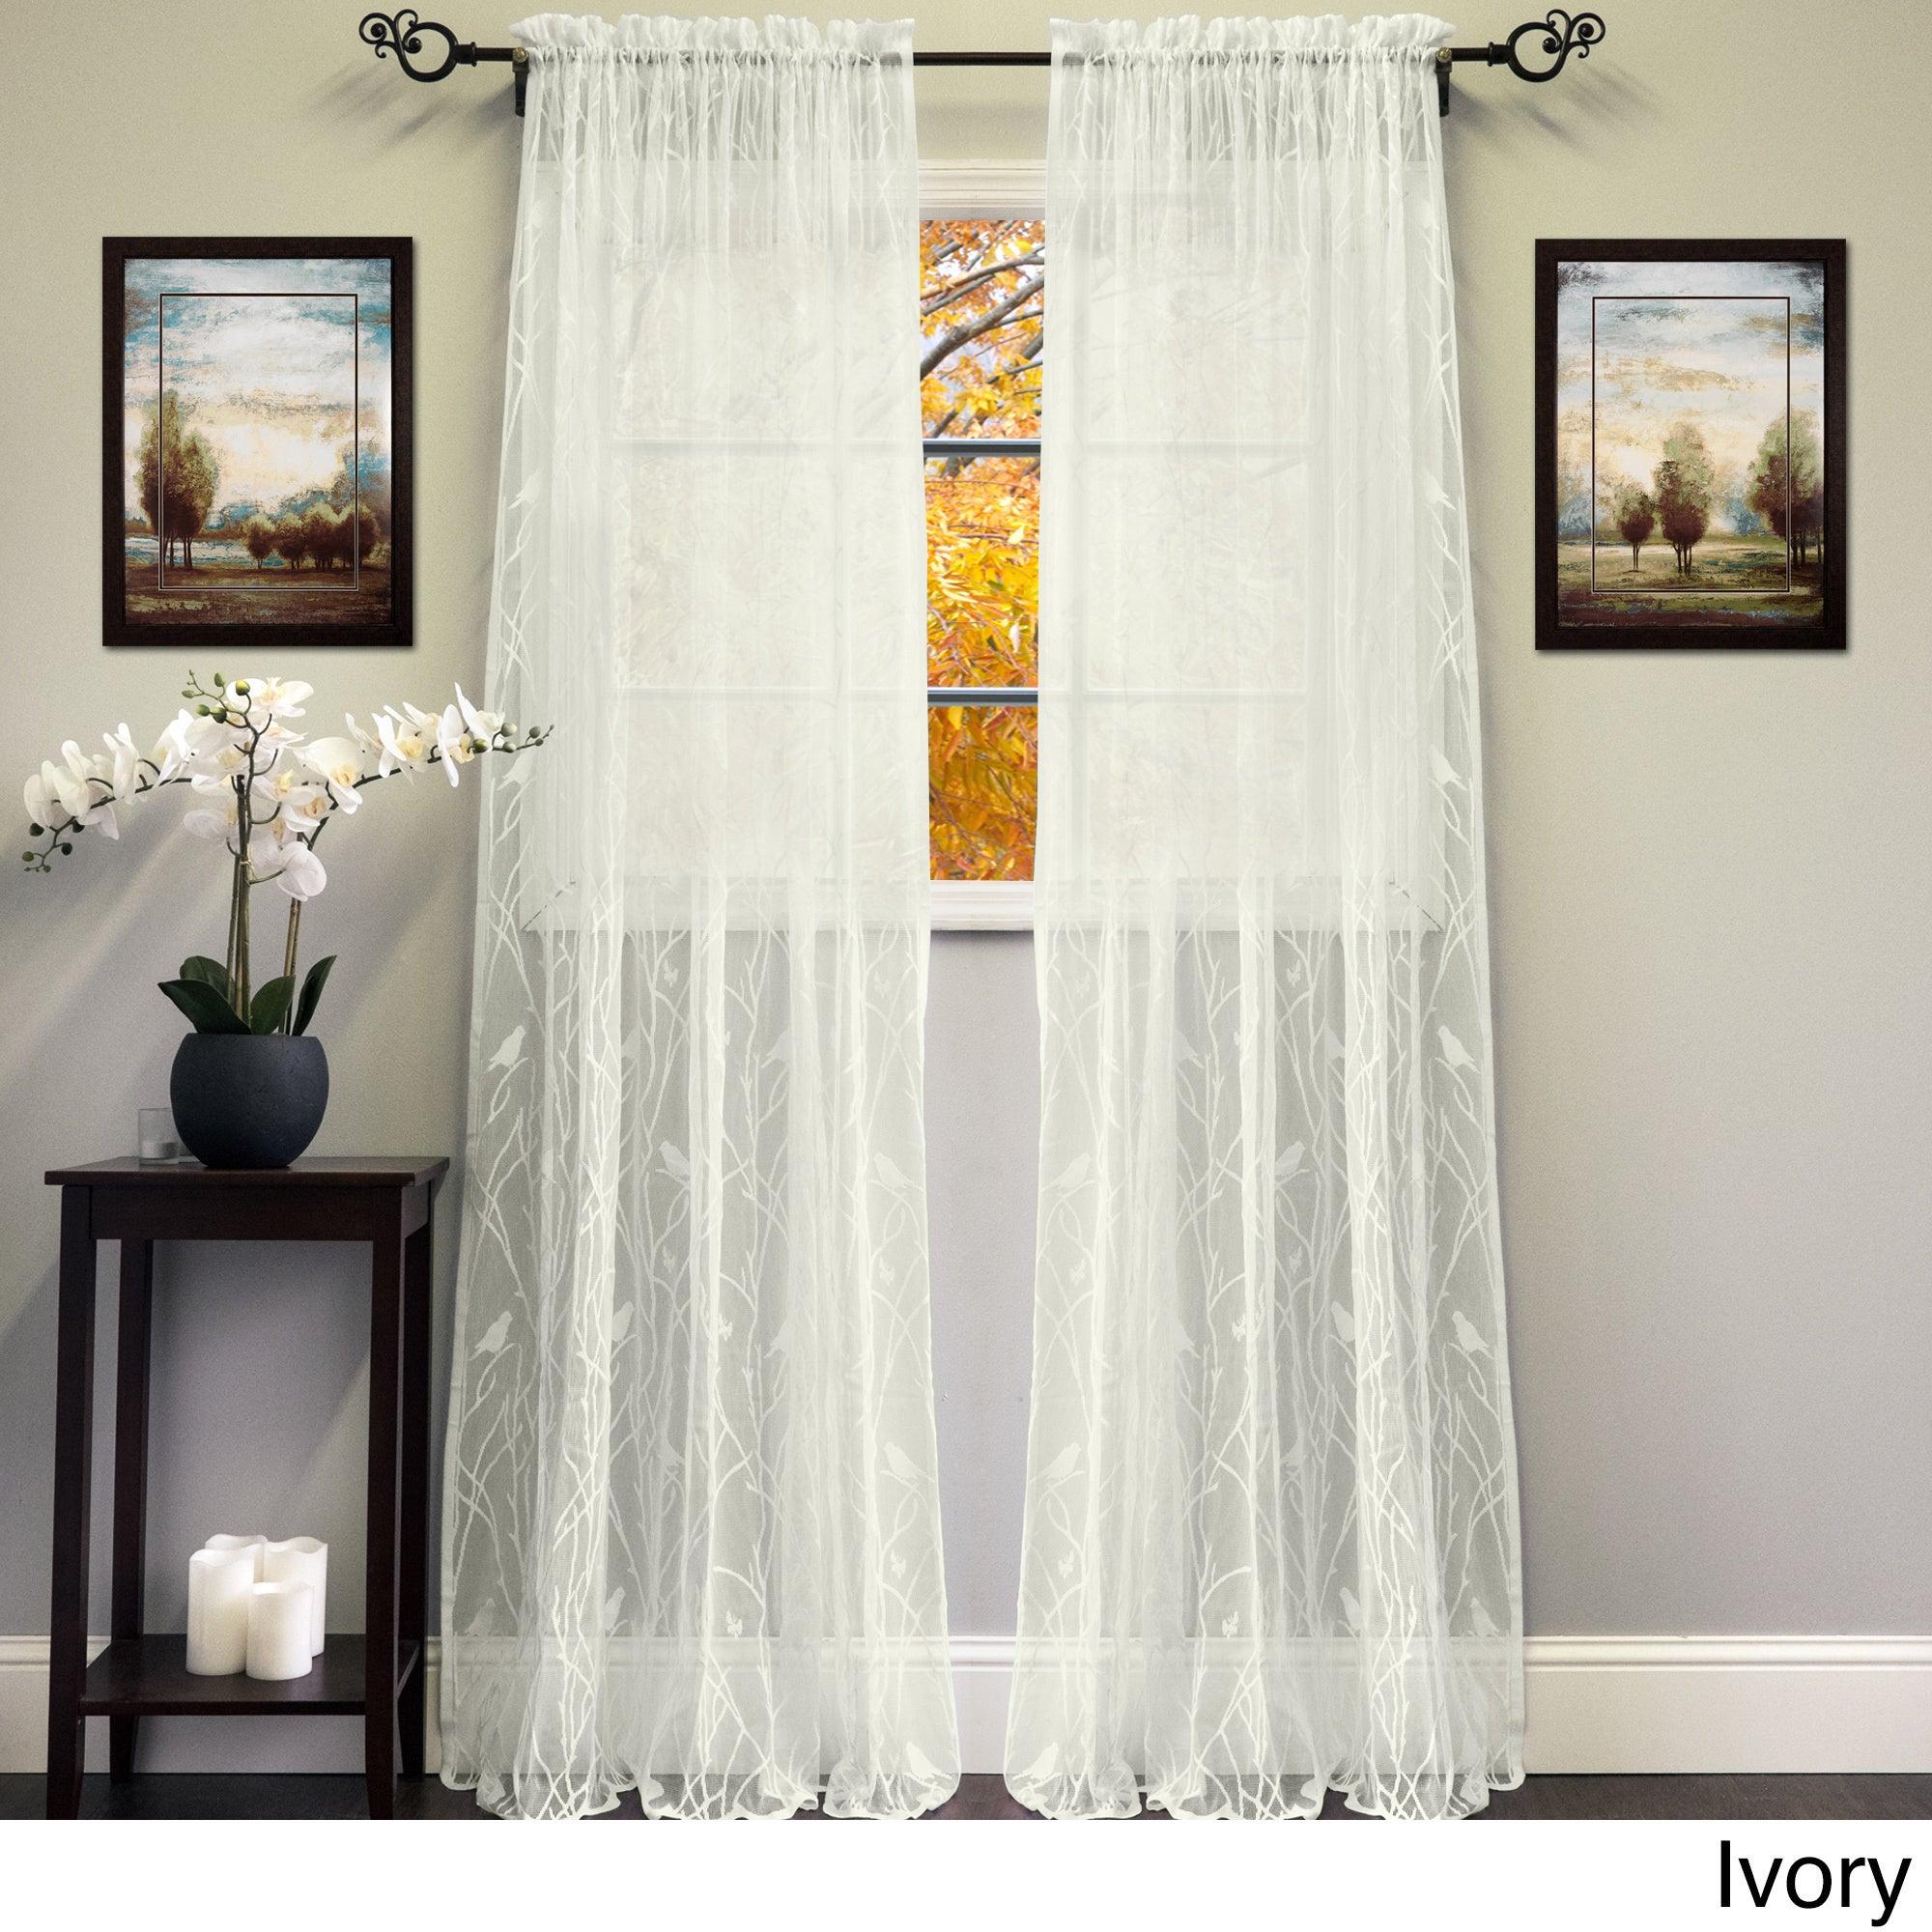 Popular Photo of Ivory Knit Lace Bird Motif Window Curtain